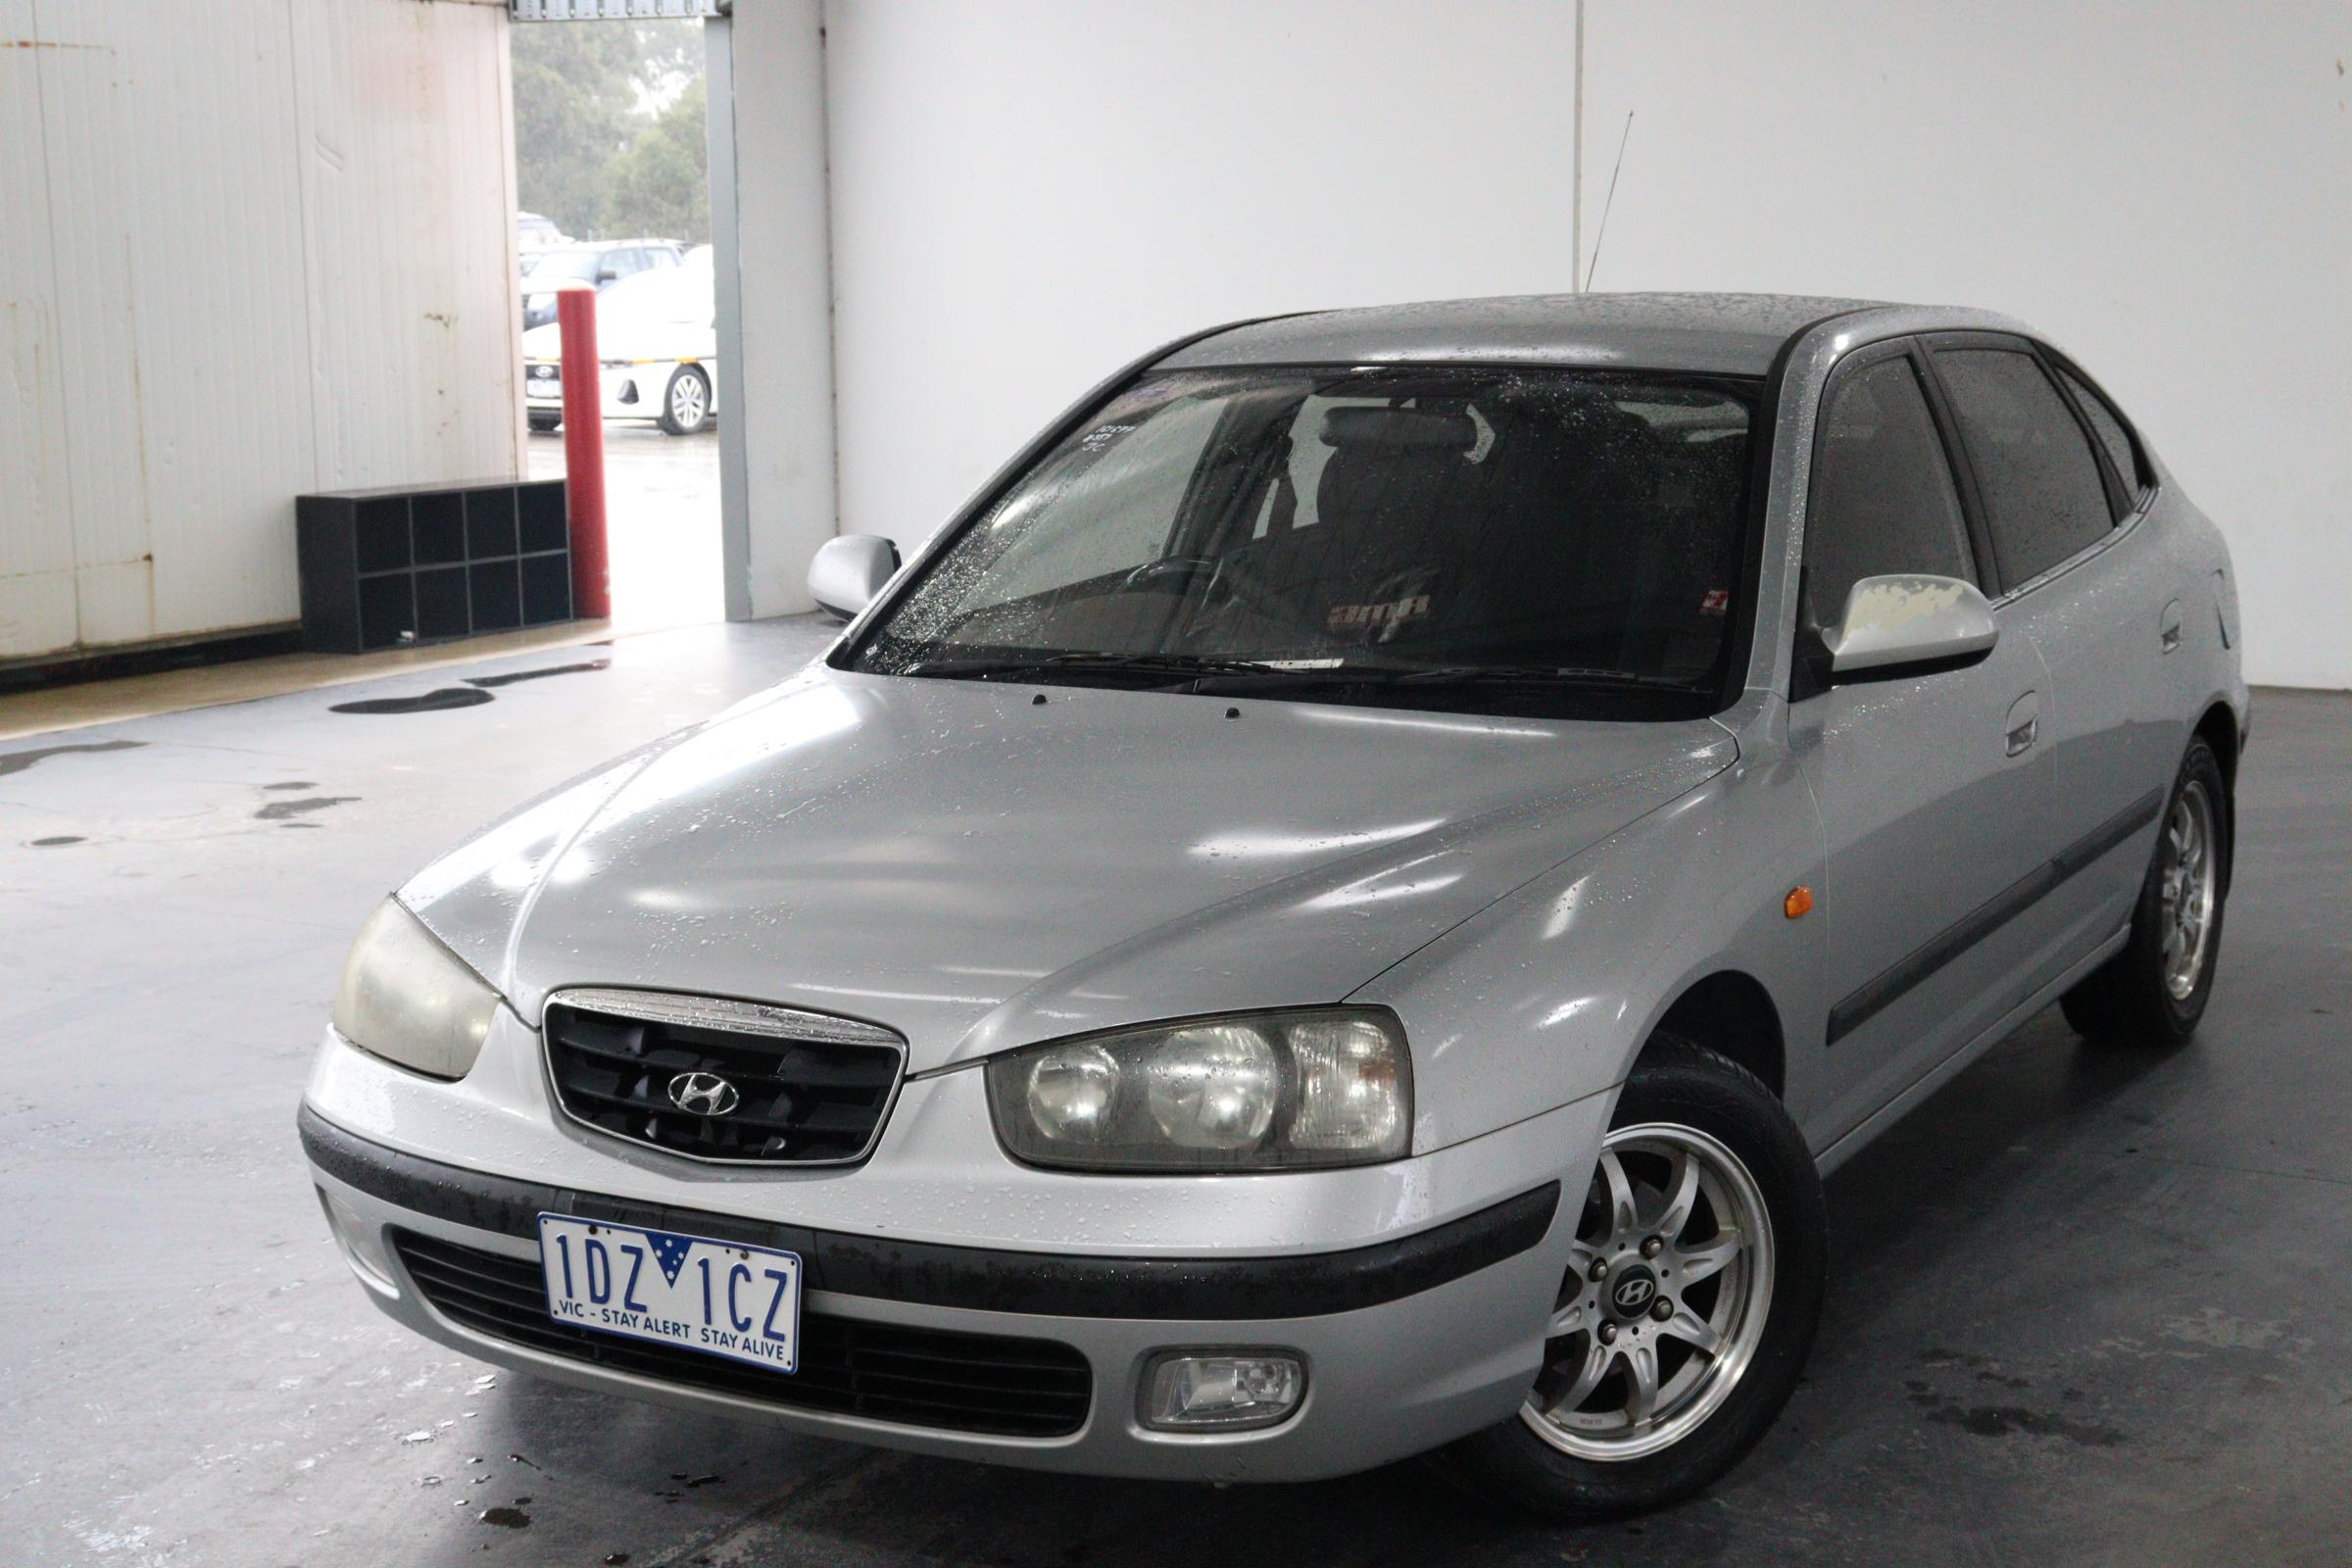 2003 Hyundai Elantra GLS XD Manual Hatchback